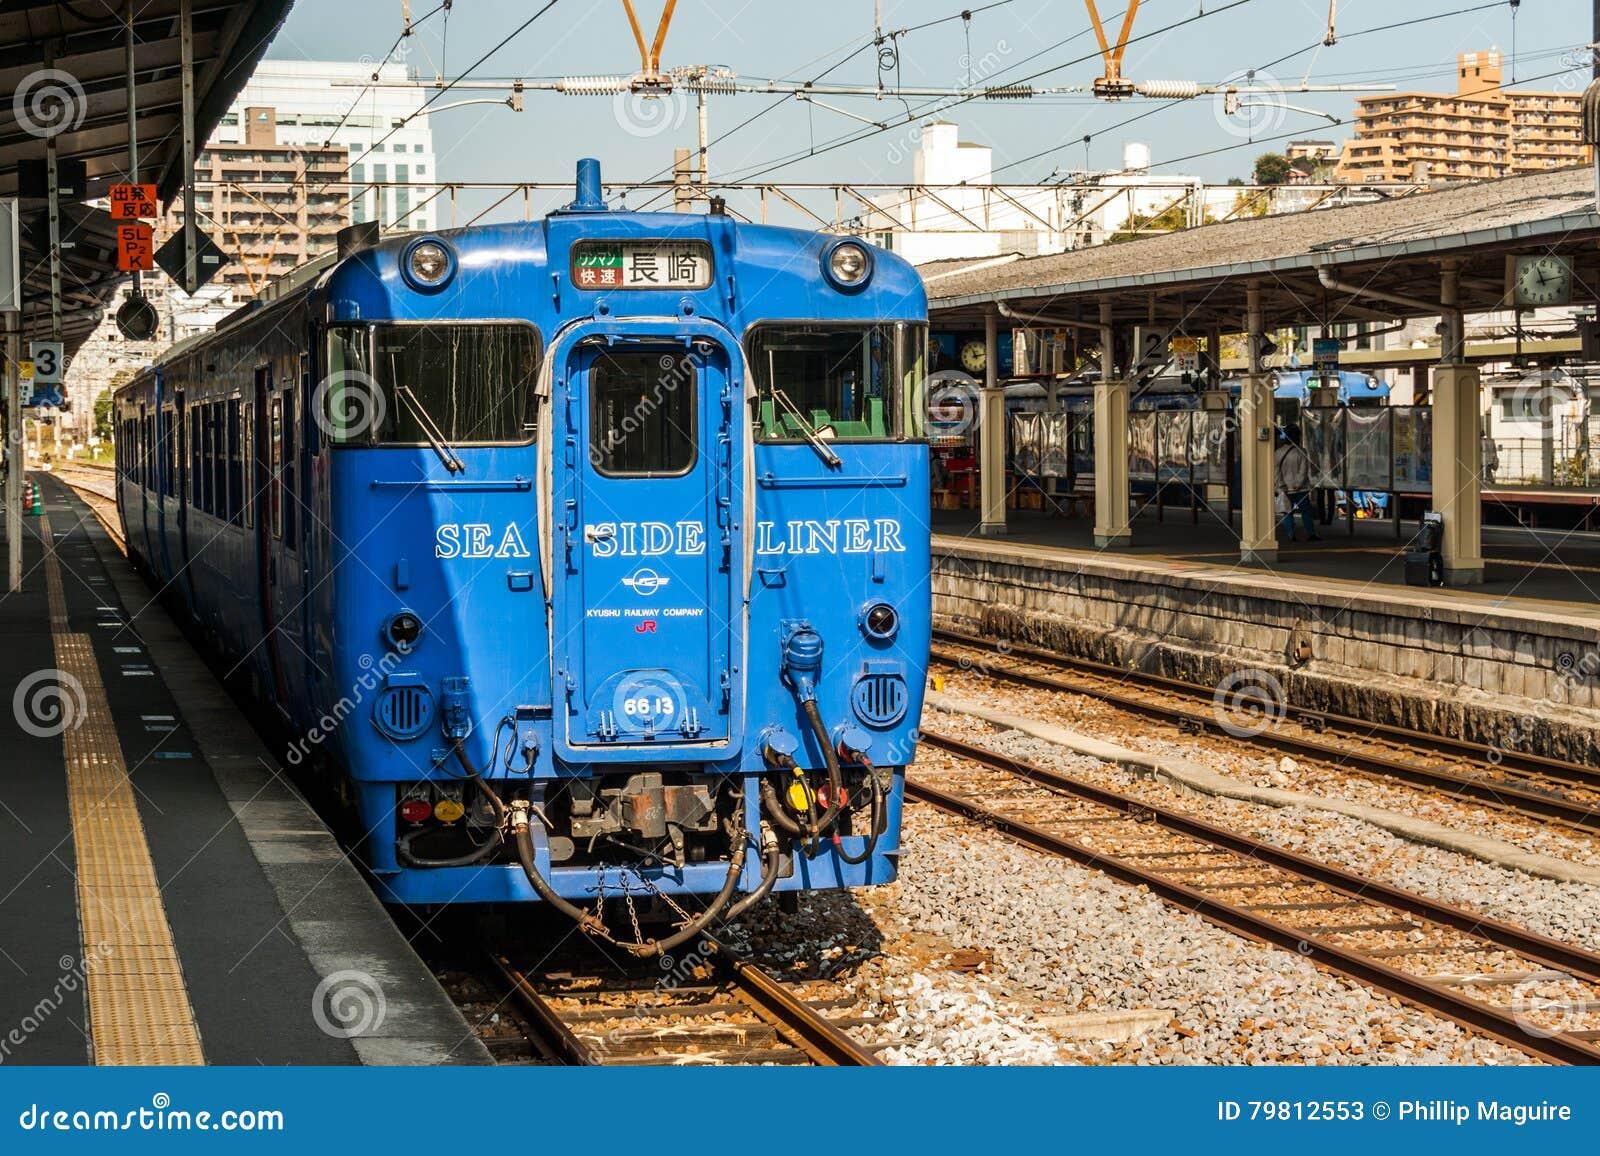 Seaside Liner' Waiting At Nagasaki Station Editorial Stock